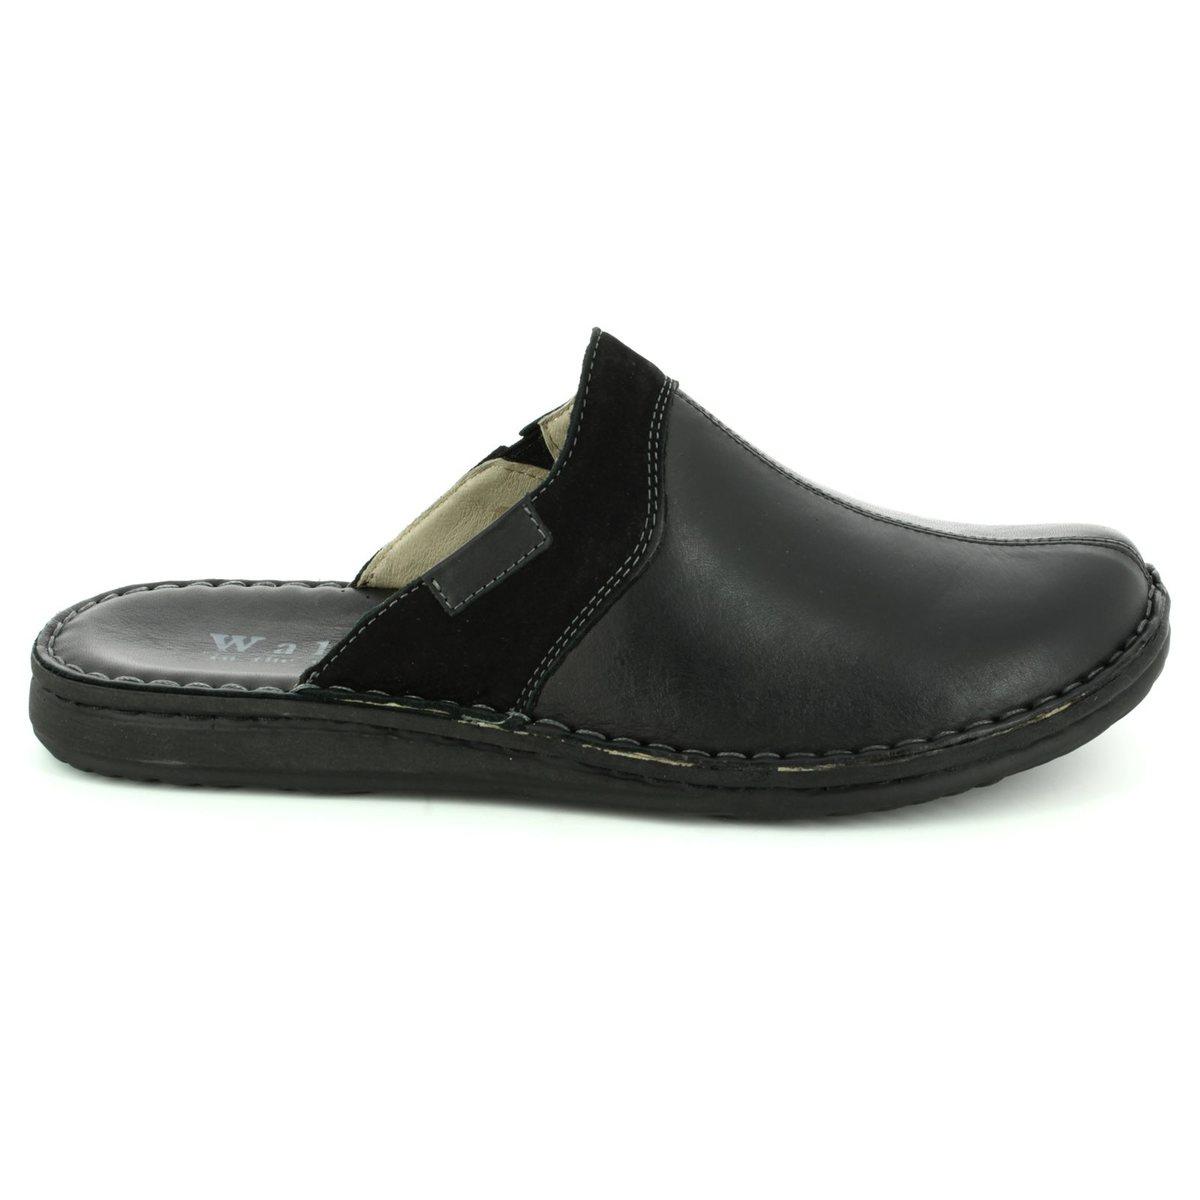 walk in the city leamu 2307 28800 black house shoe